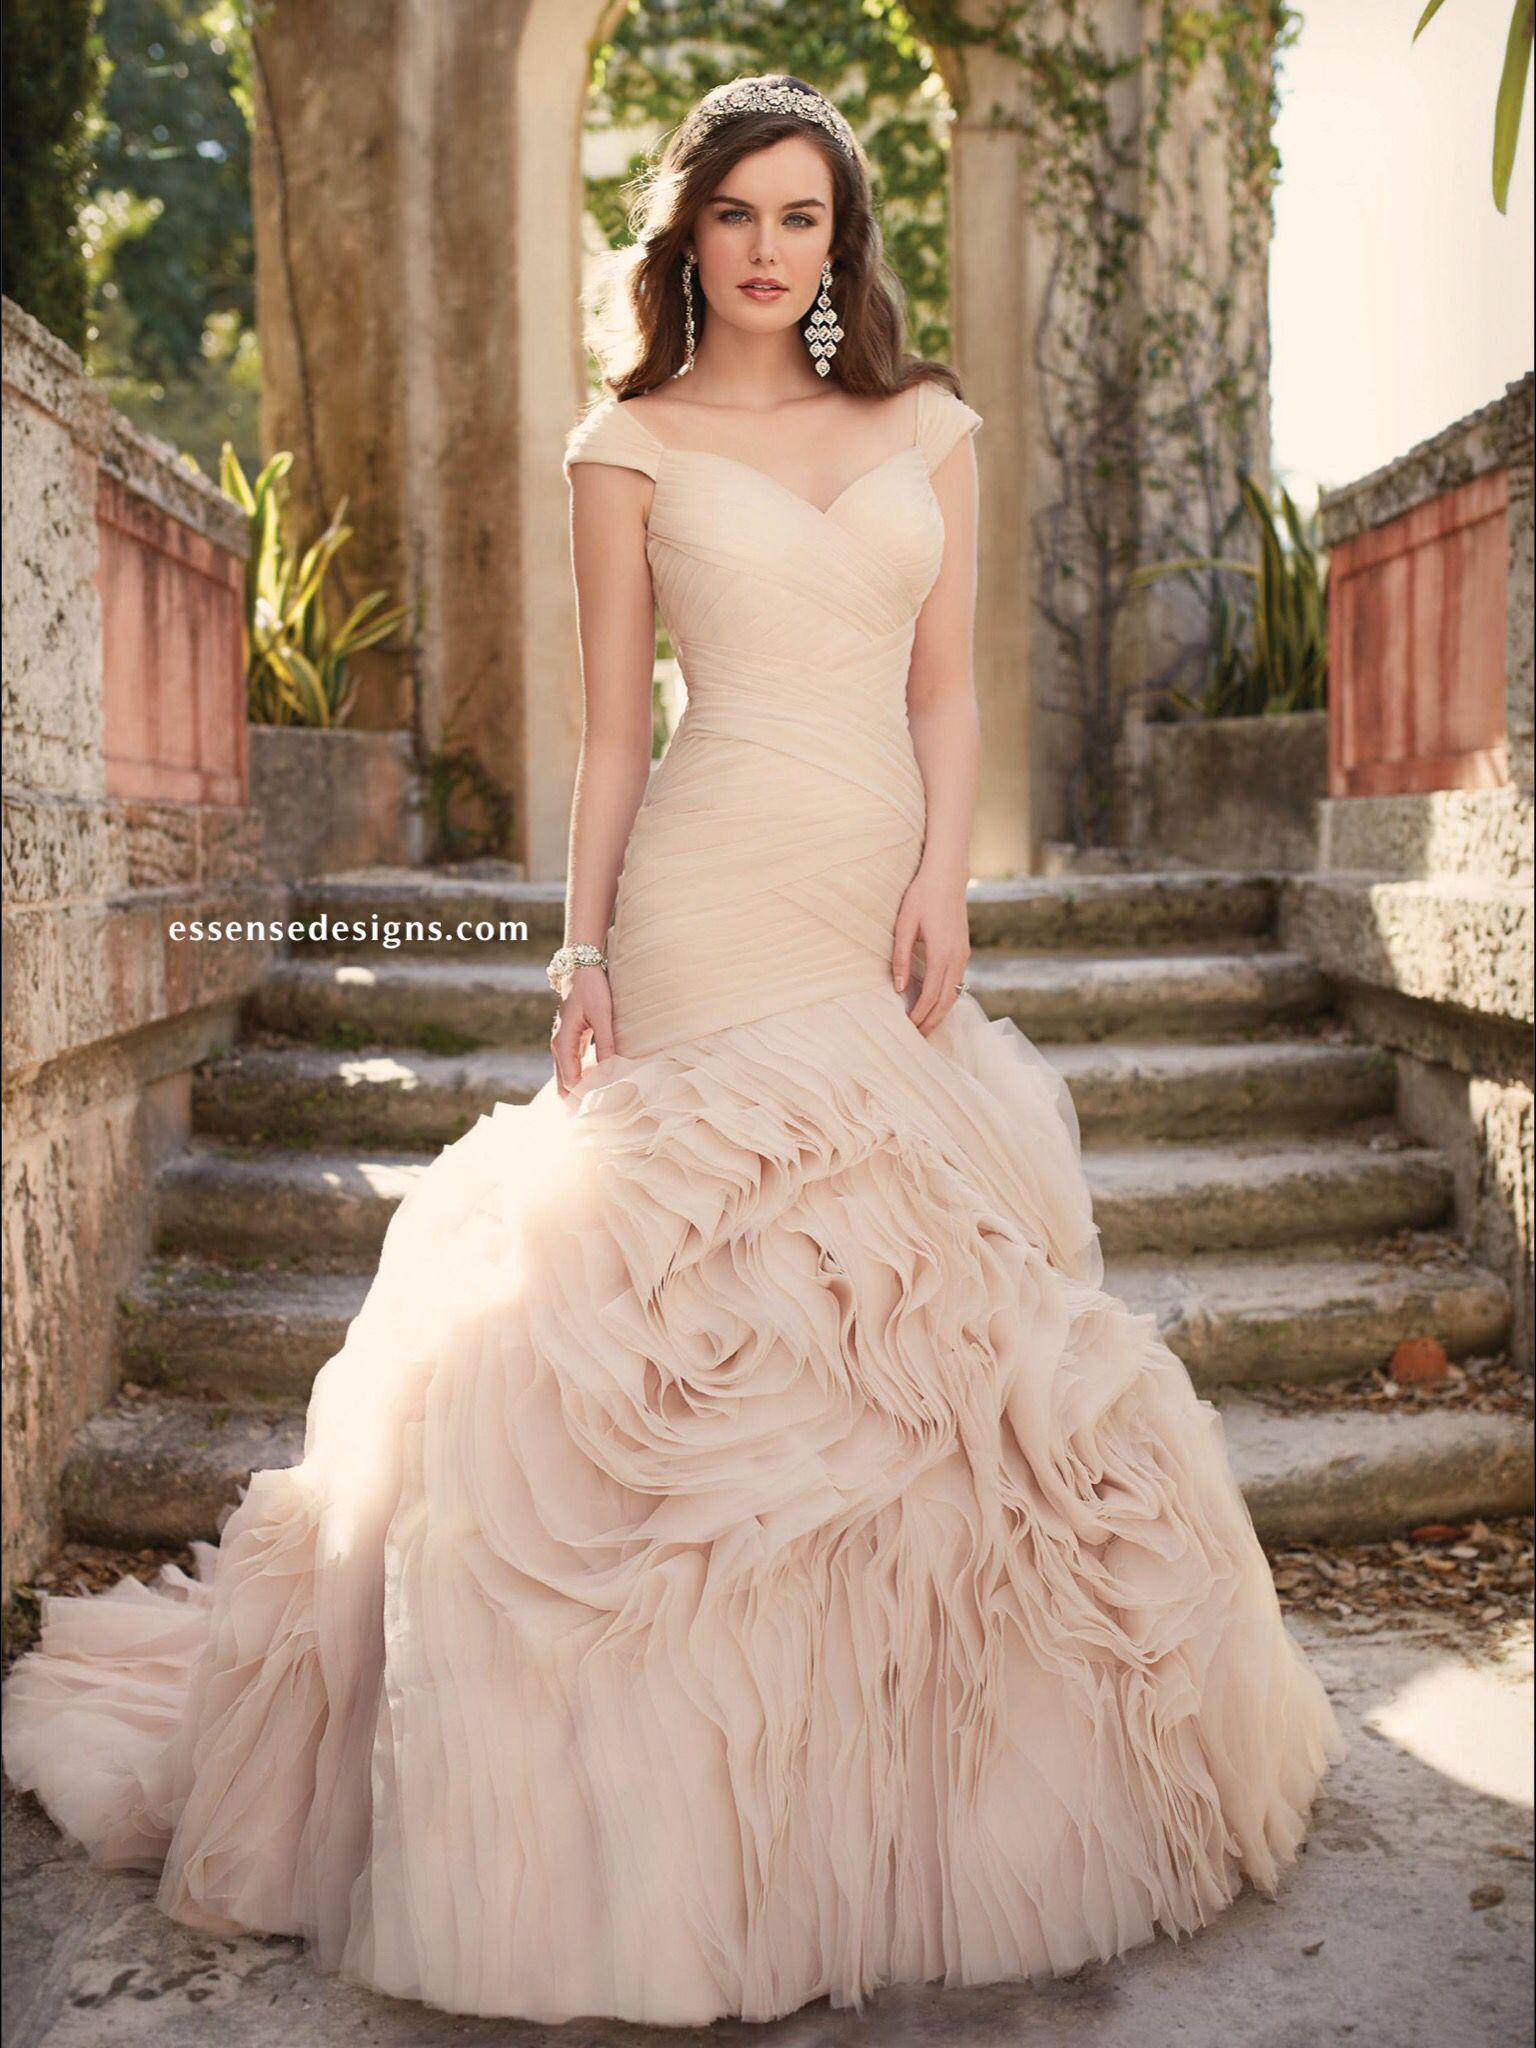 Essence Bridal | Colorful Wedding Dresses | Pinterest | Colorful ...